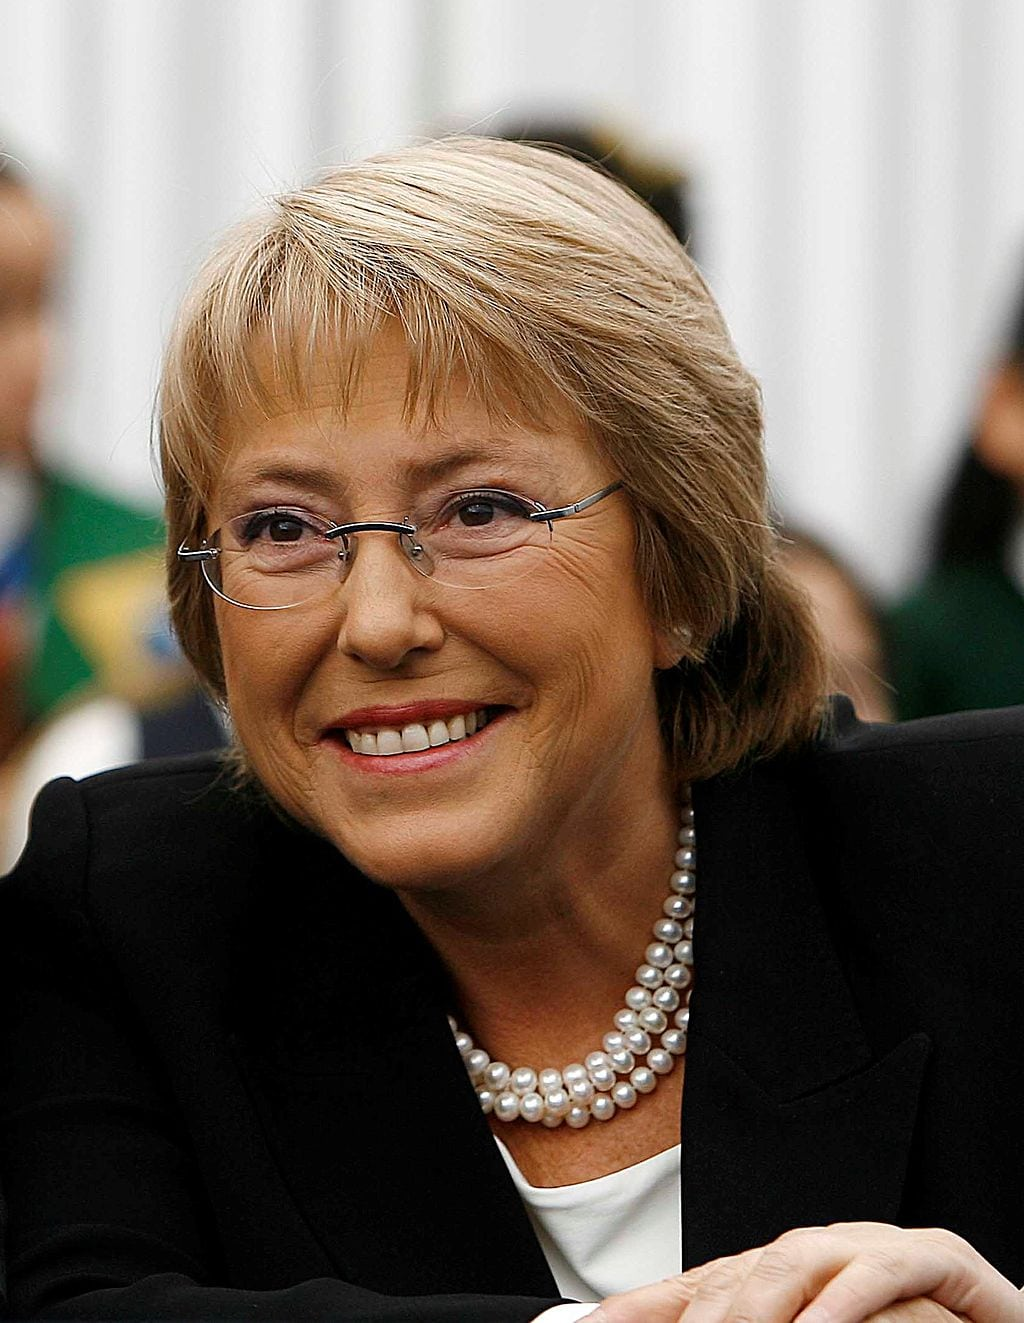 Chili, une bourguignonne présidente